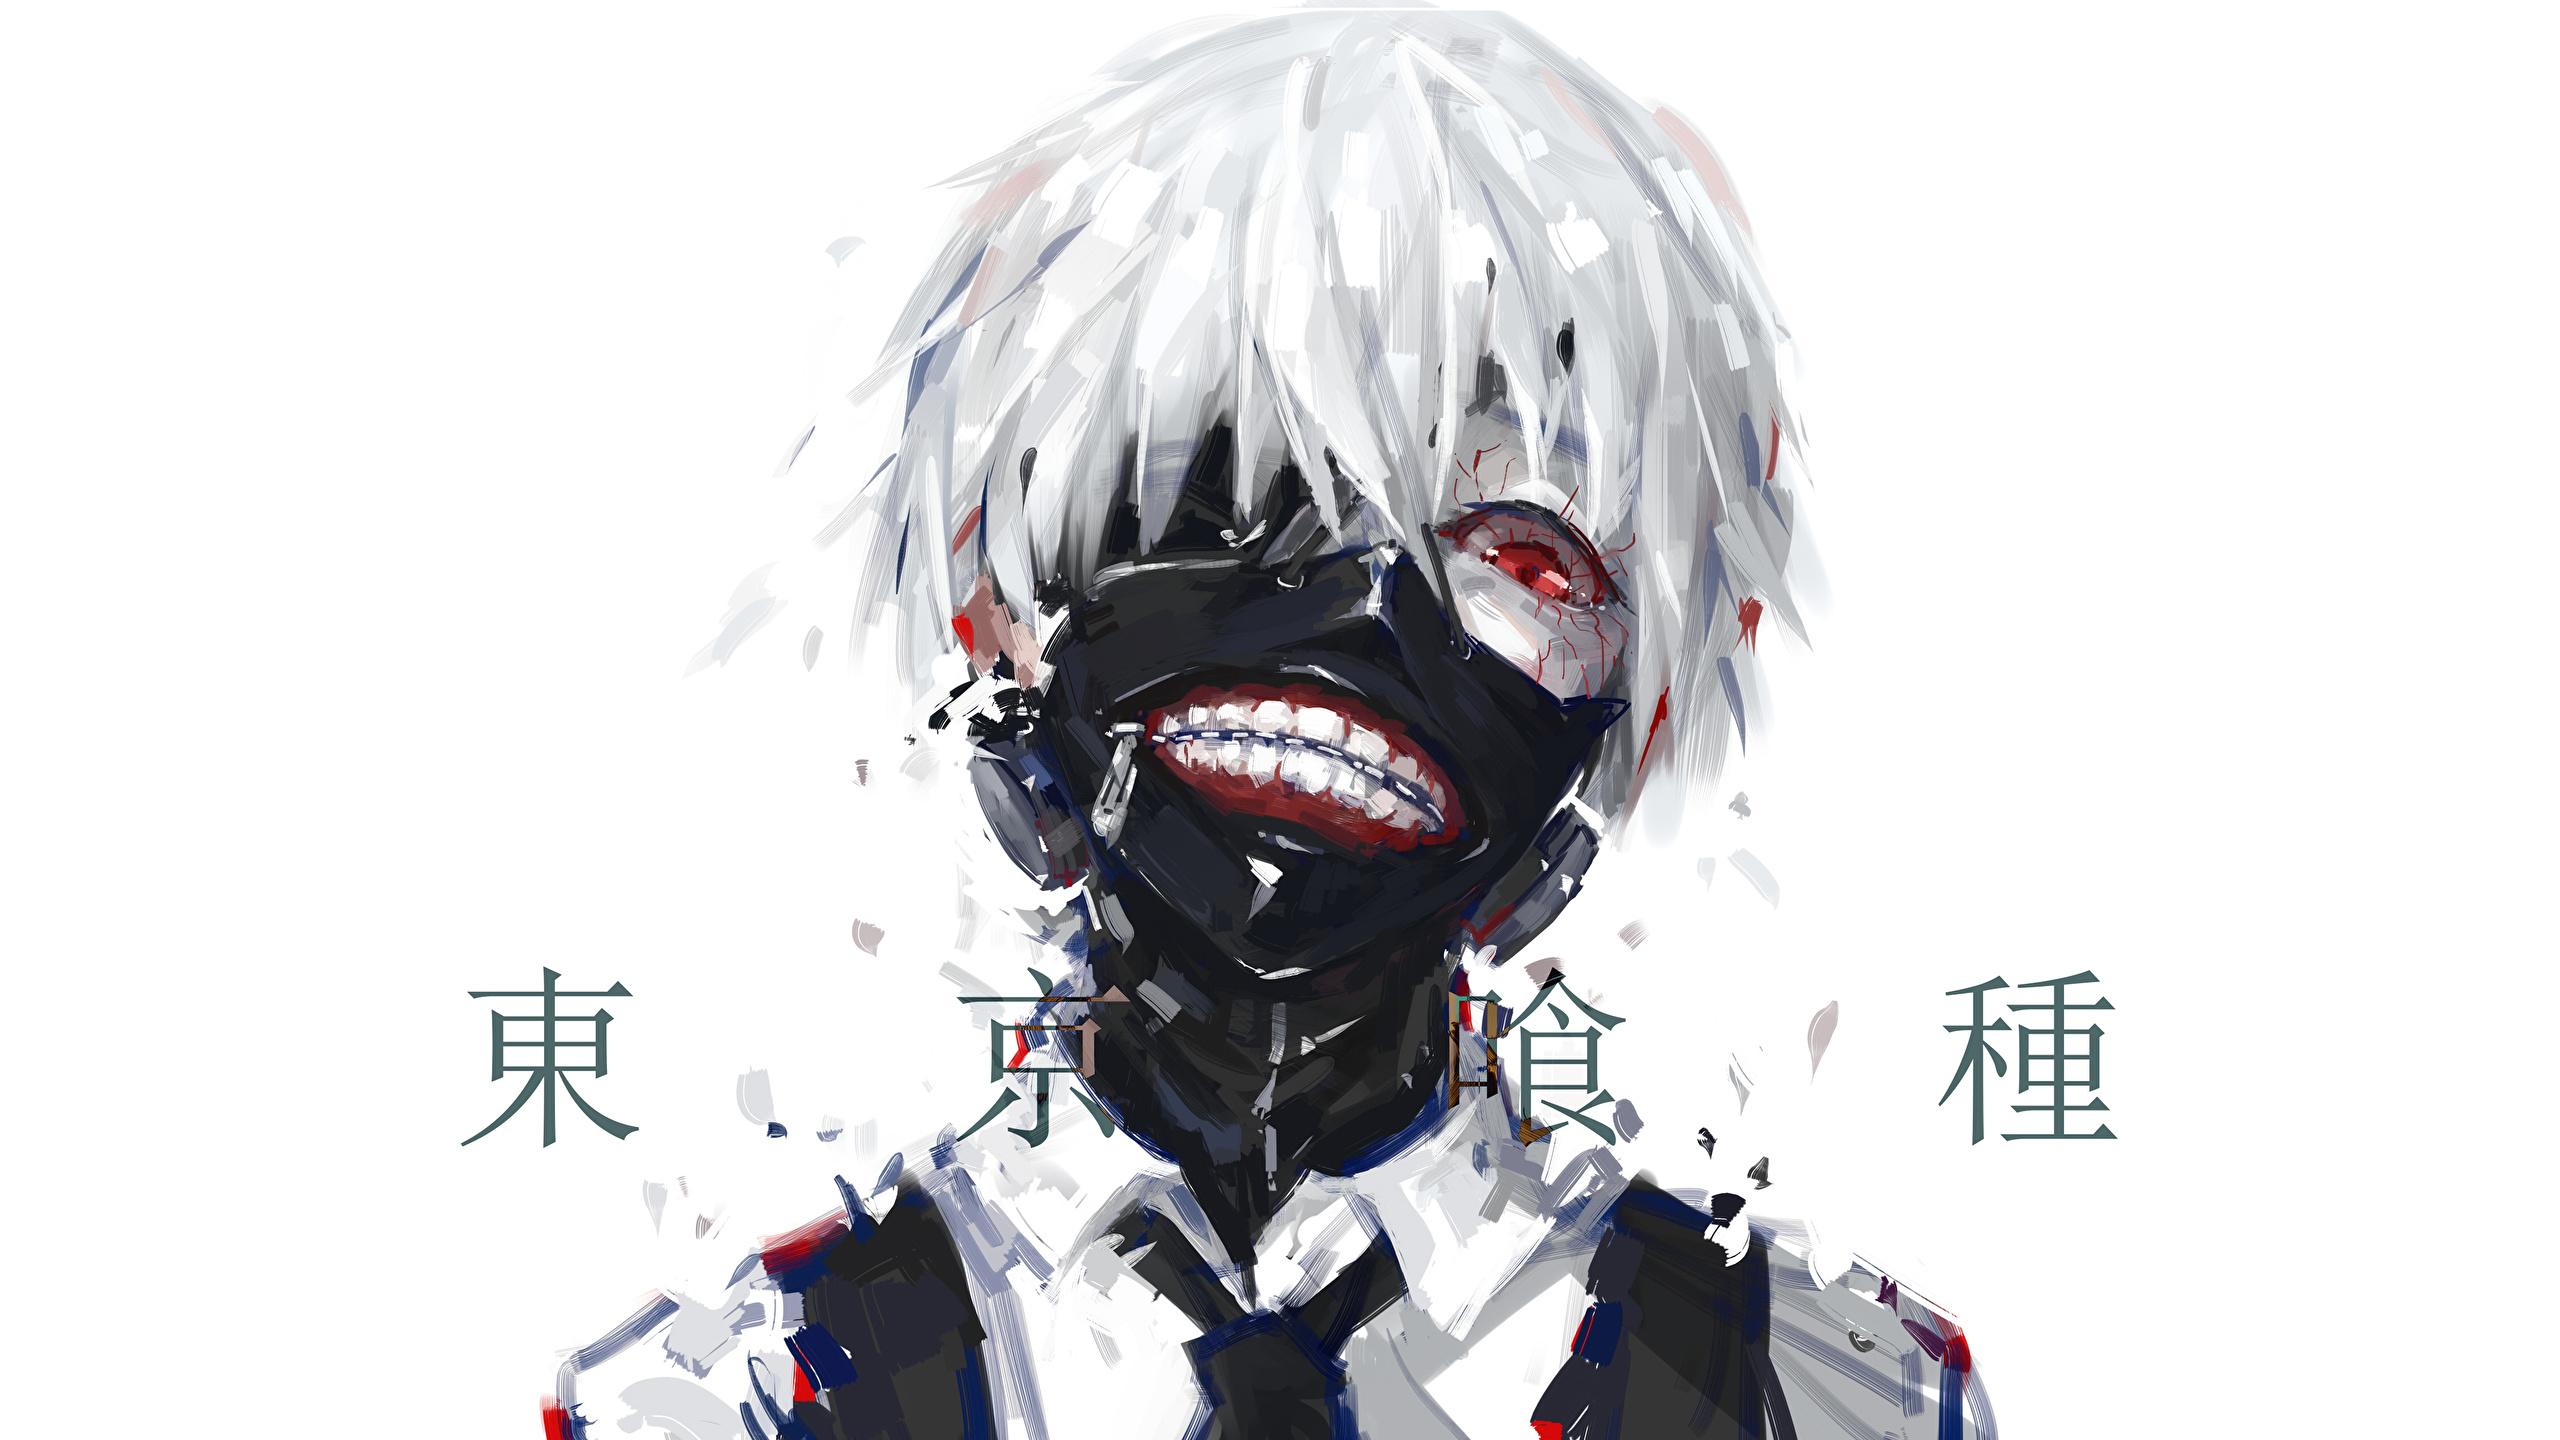 Fondos De Pantalla 2560x1440 Máscara Tokyo Ghoul Hombre